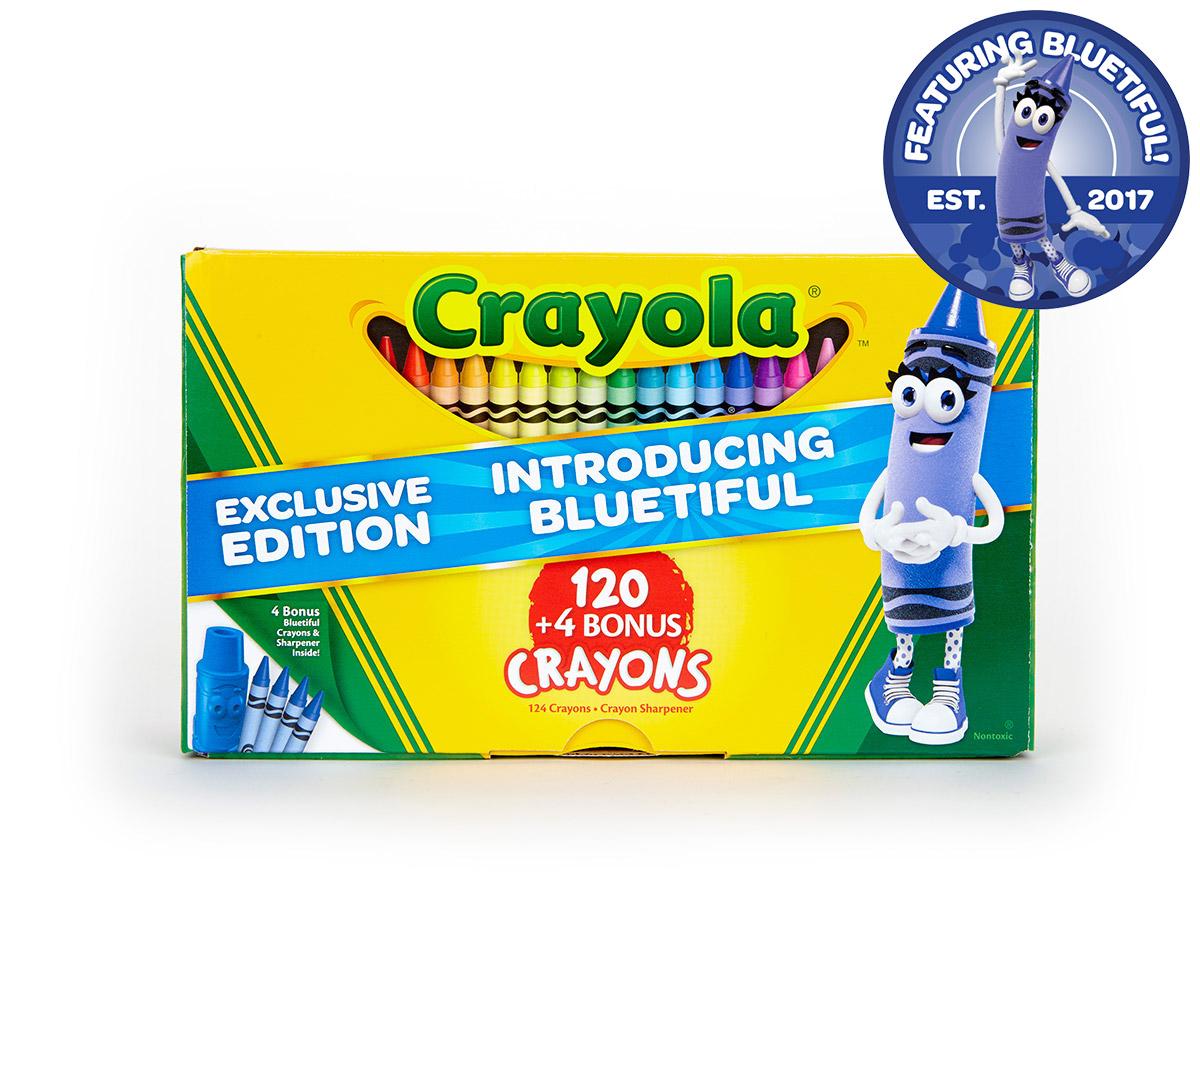 Bluetiful Crayola 124 Crayons